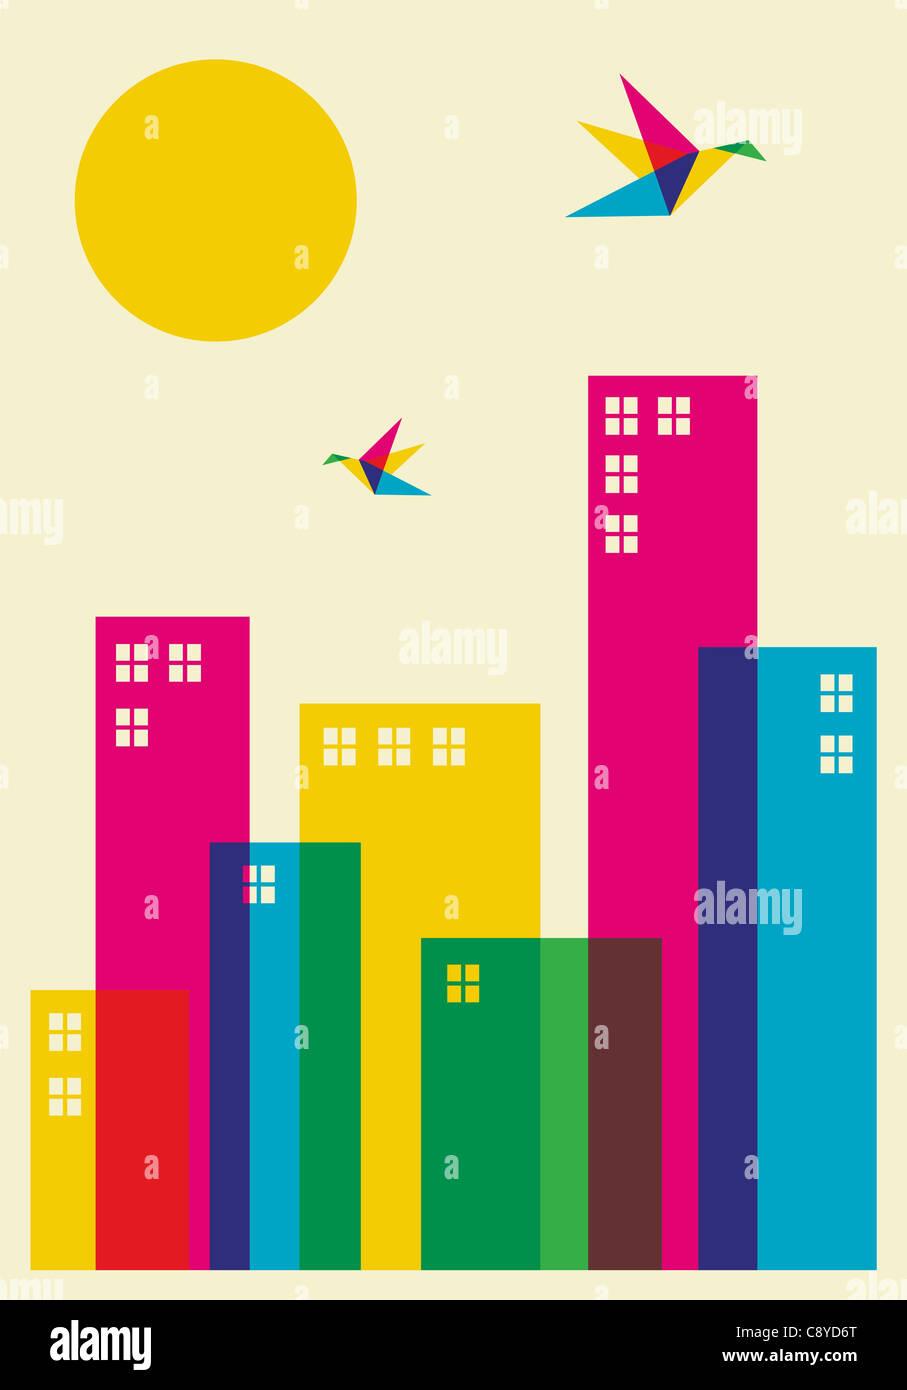 Primavera tempo na cidade. Zumbido grave de cores de pássaros voando sobre a cidade. Arquivo de vetor disponíveis. Imagens de Stock